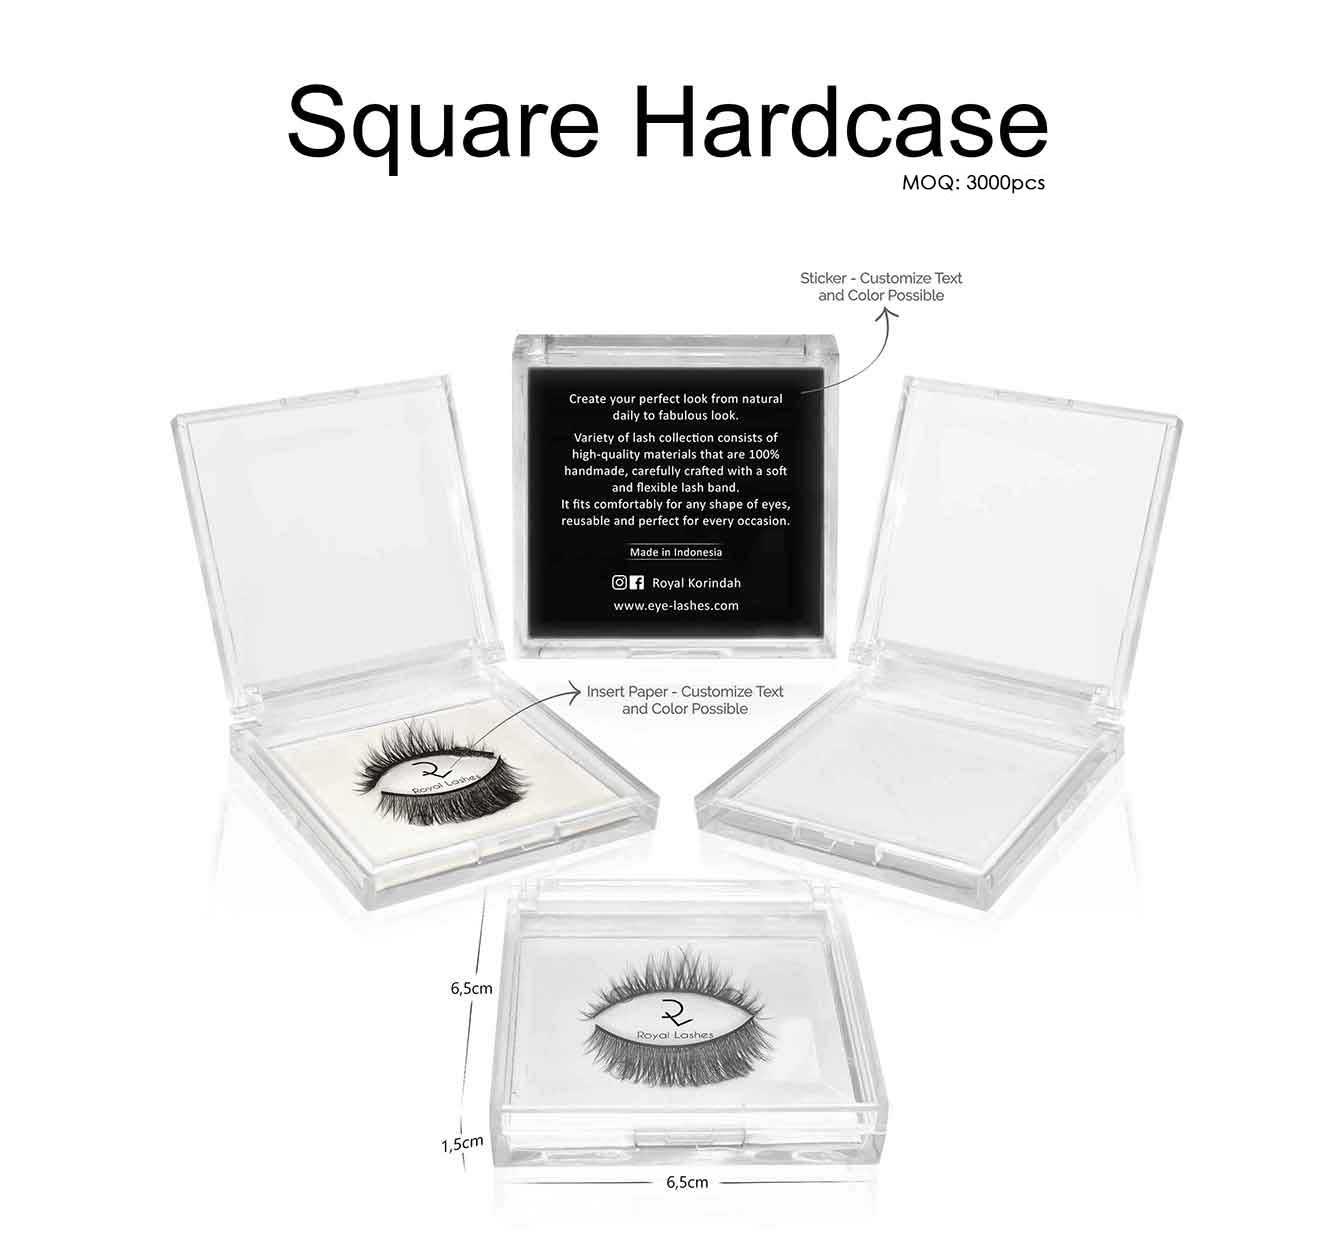 Square-Hardcase-moq3000